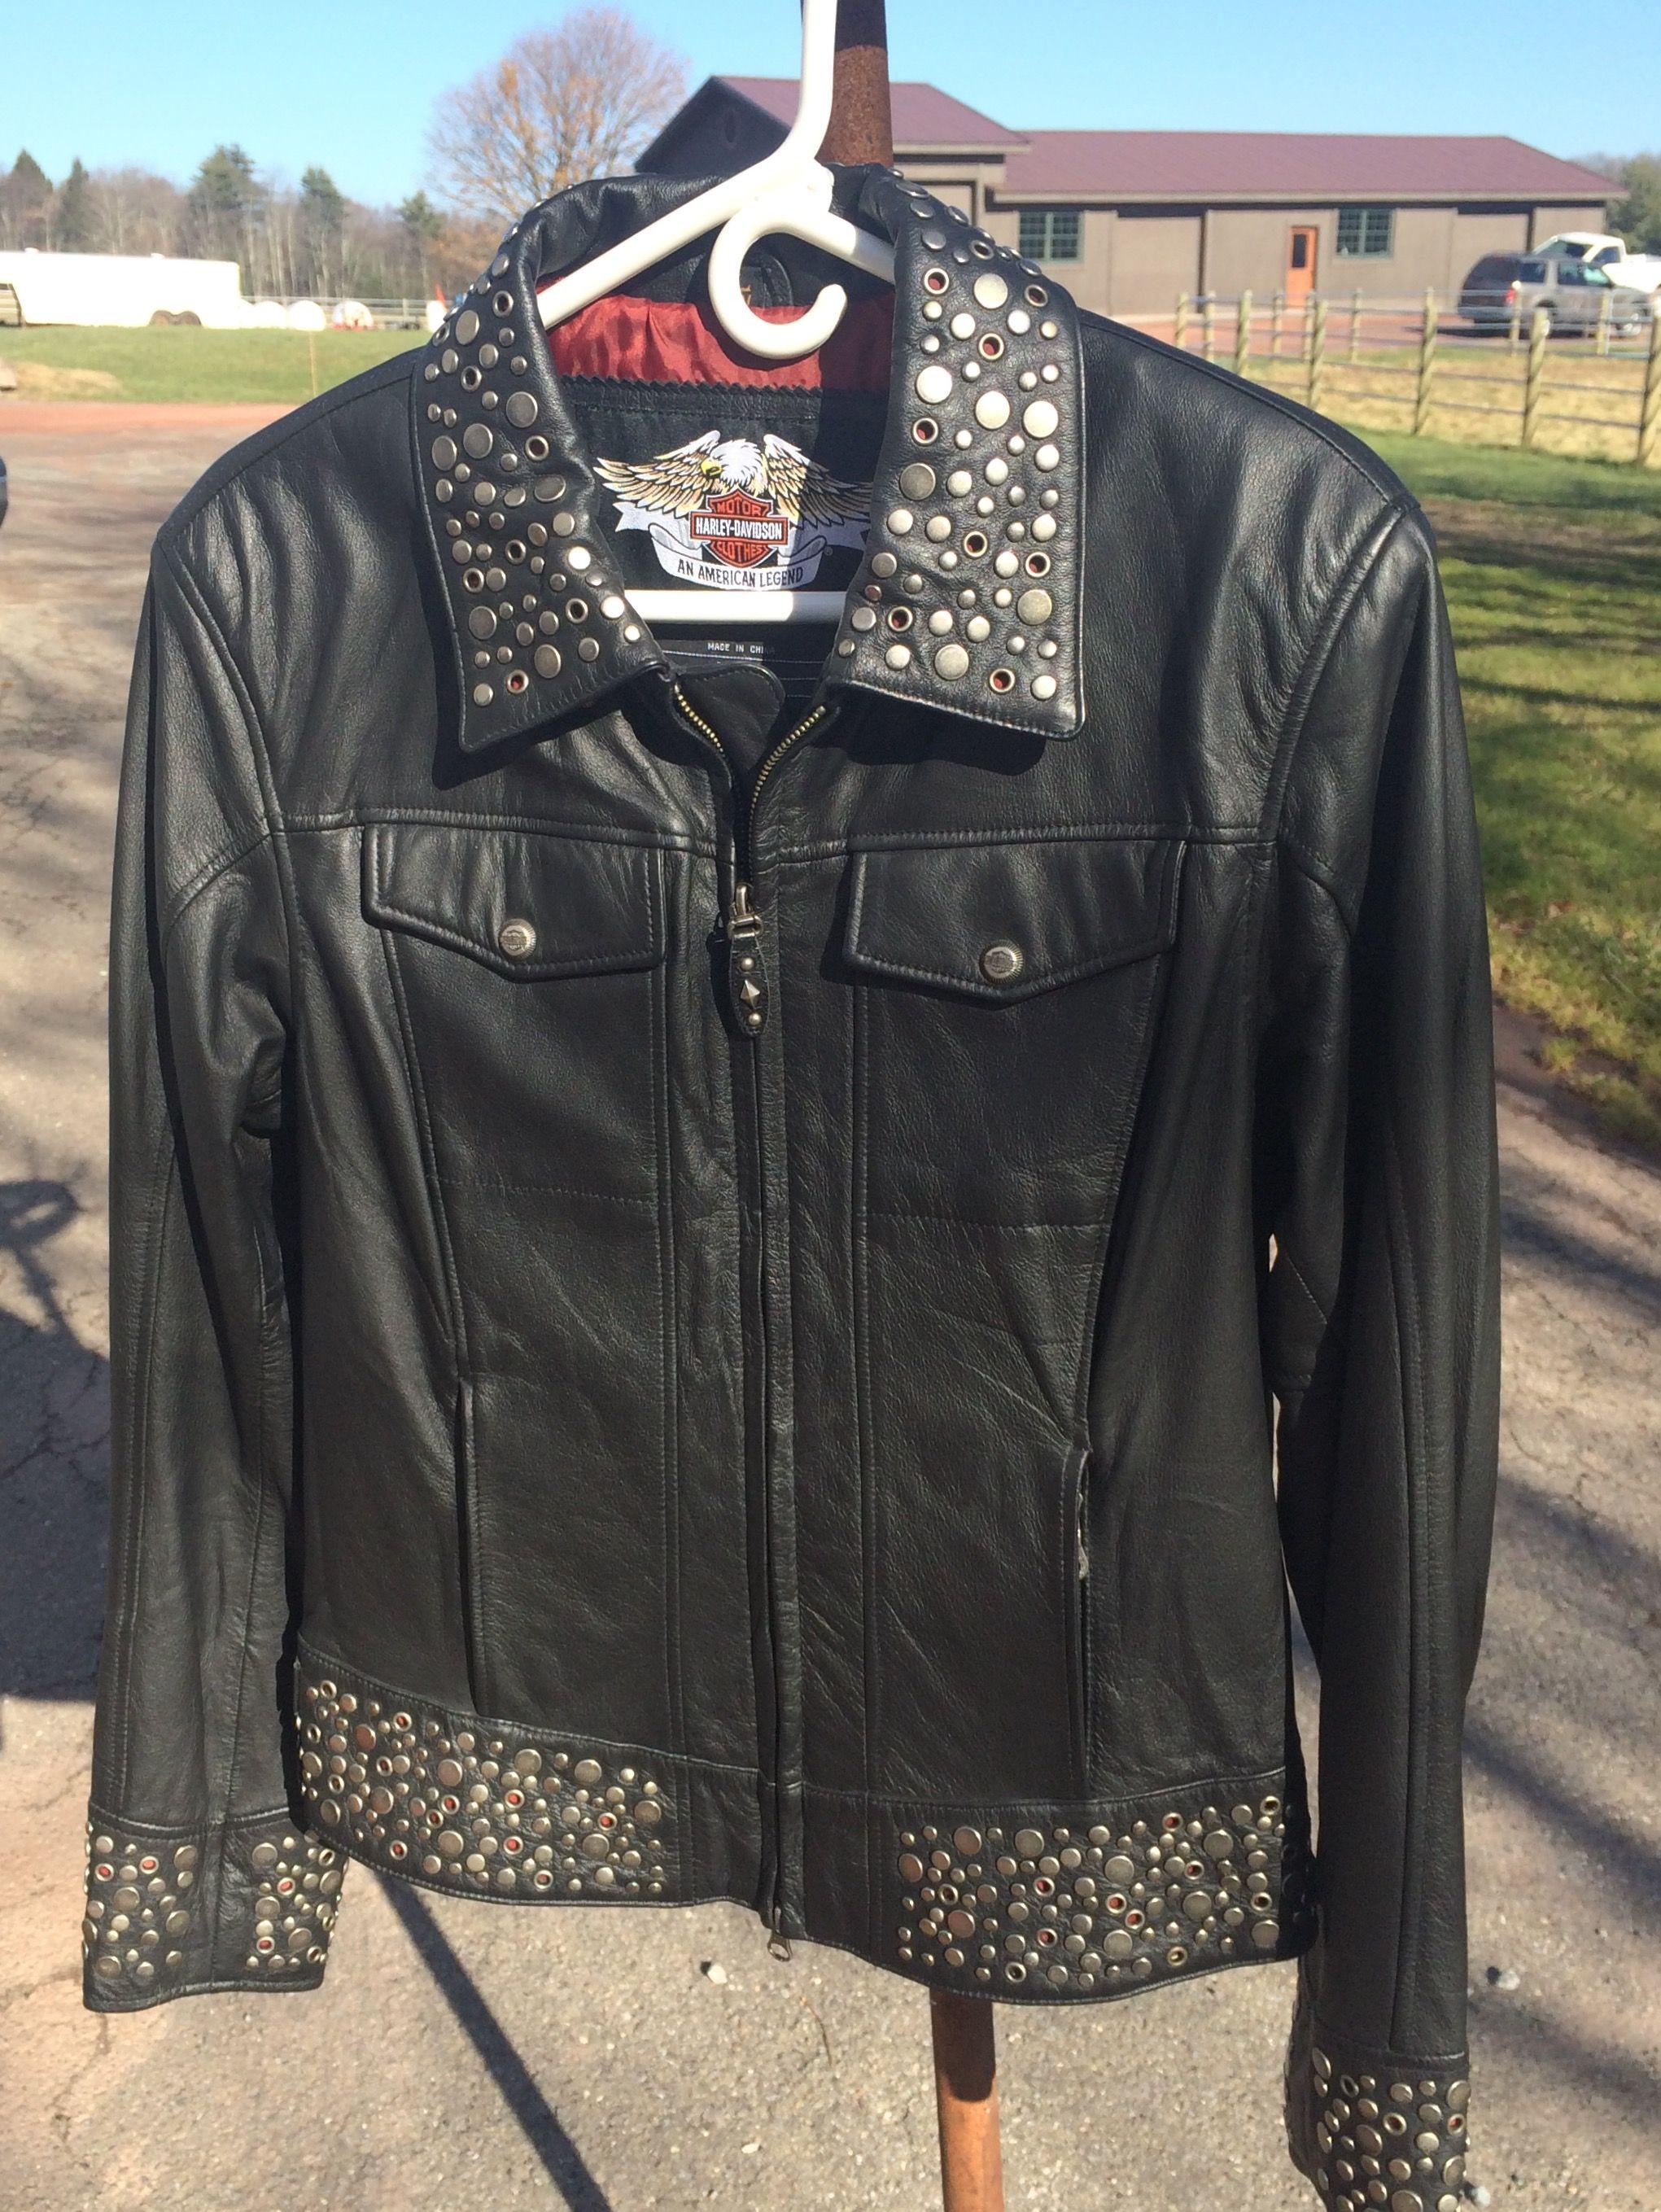 Harley Davidson Roxy Ladies Leather Jacket Leatherjacket Harleydavidson Roxy Leather Jackets Women Leather Jacket Leather Women [ 2718 x 2041 Pixel ]